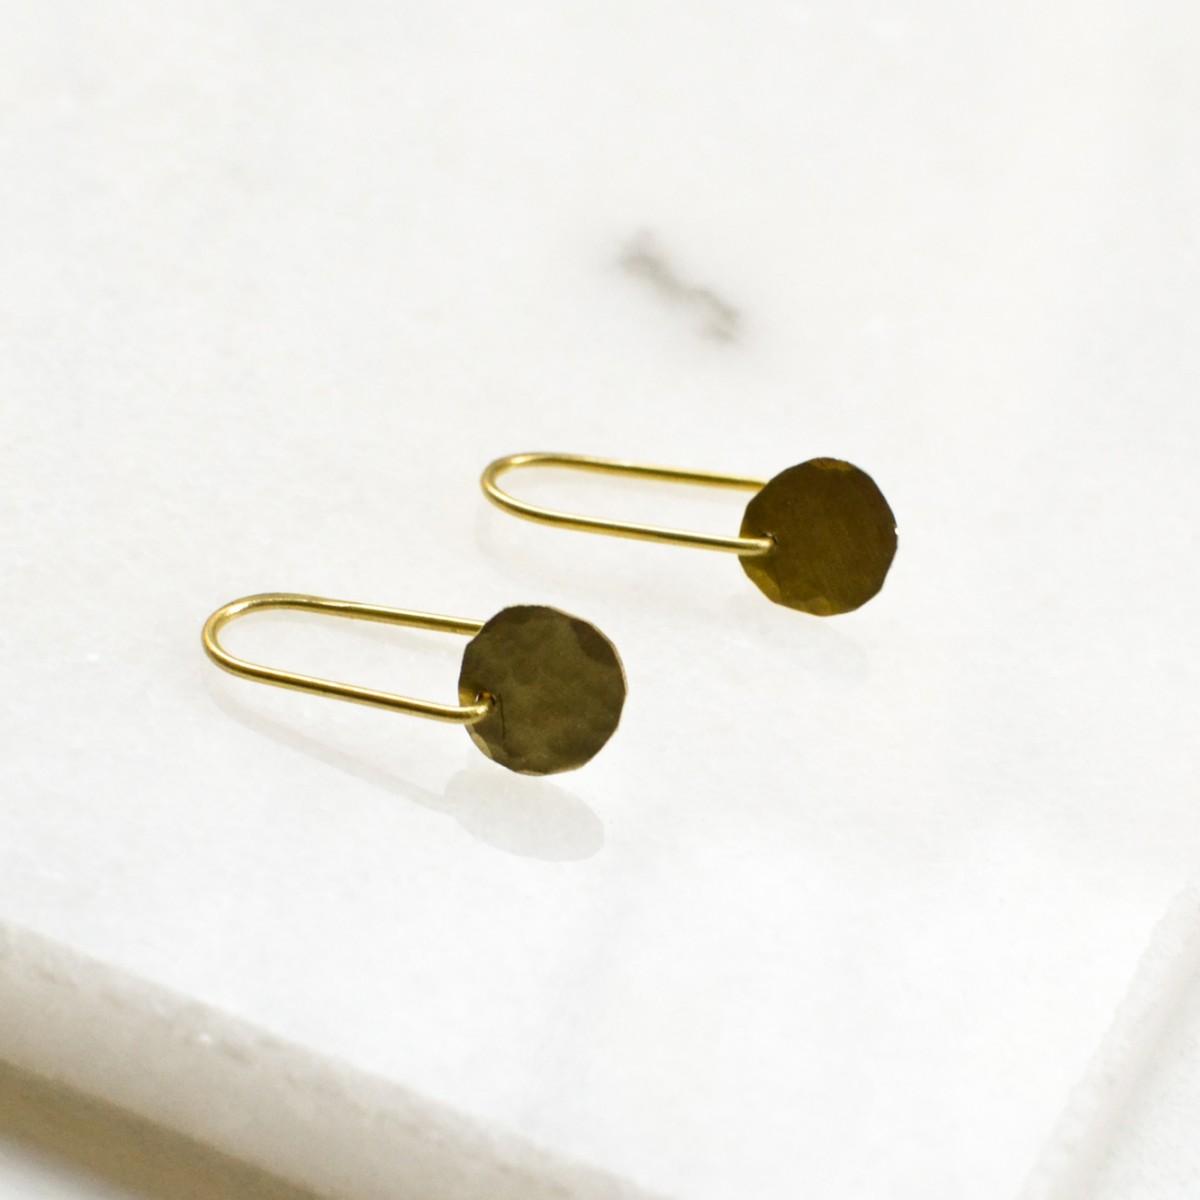 Gudbling // Minimalistische Kreis Ohrringe